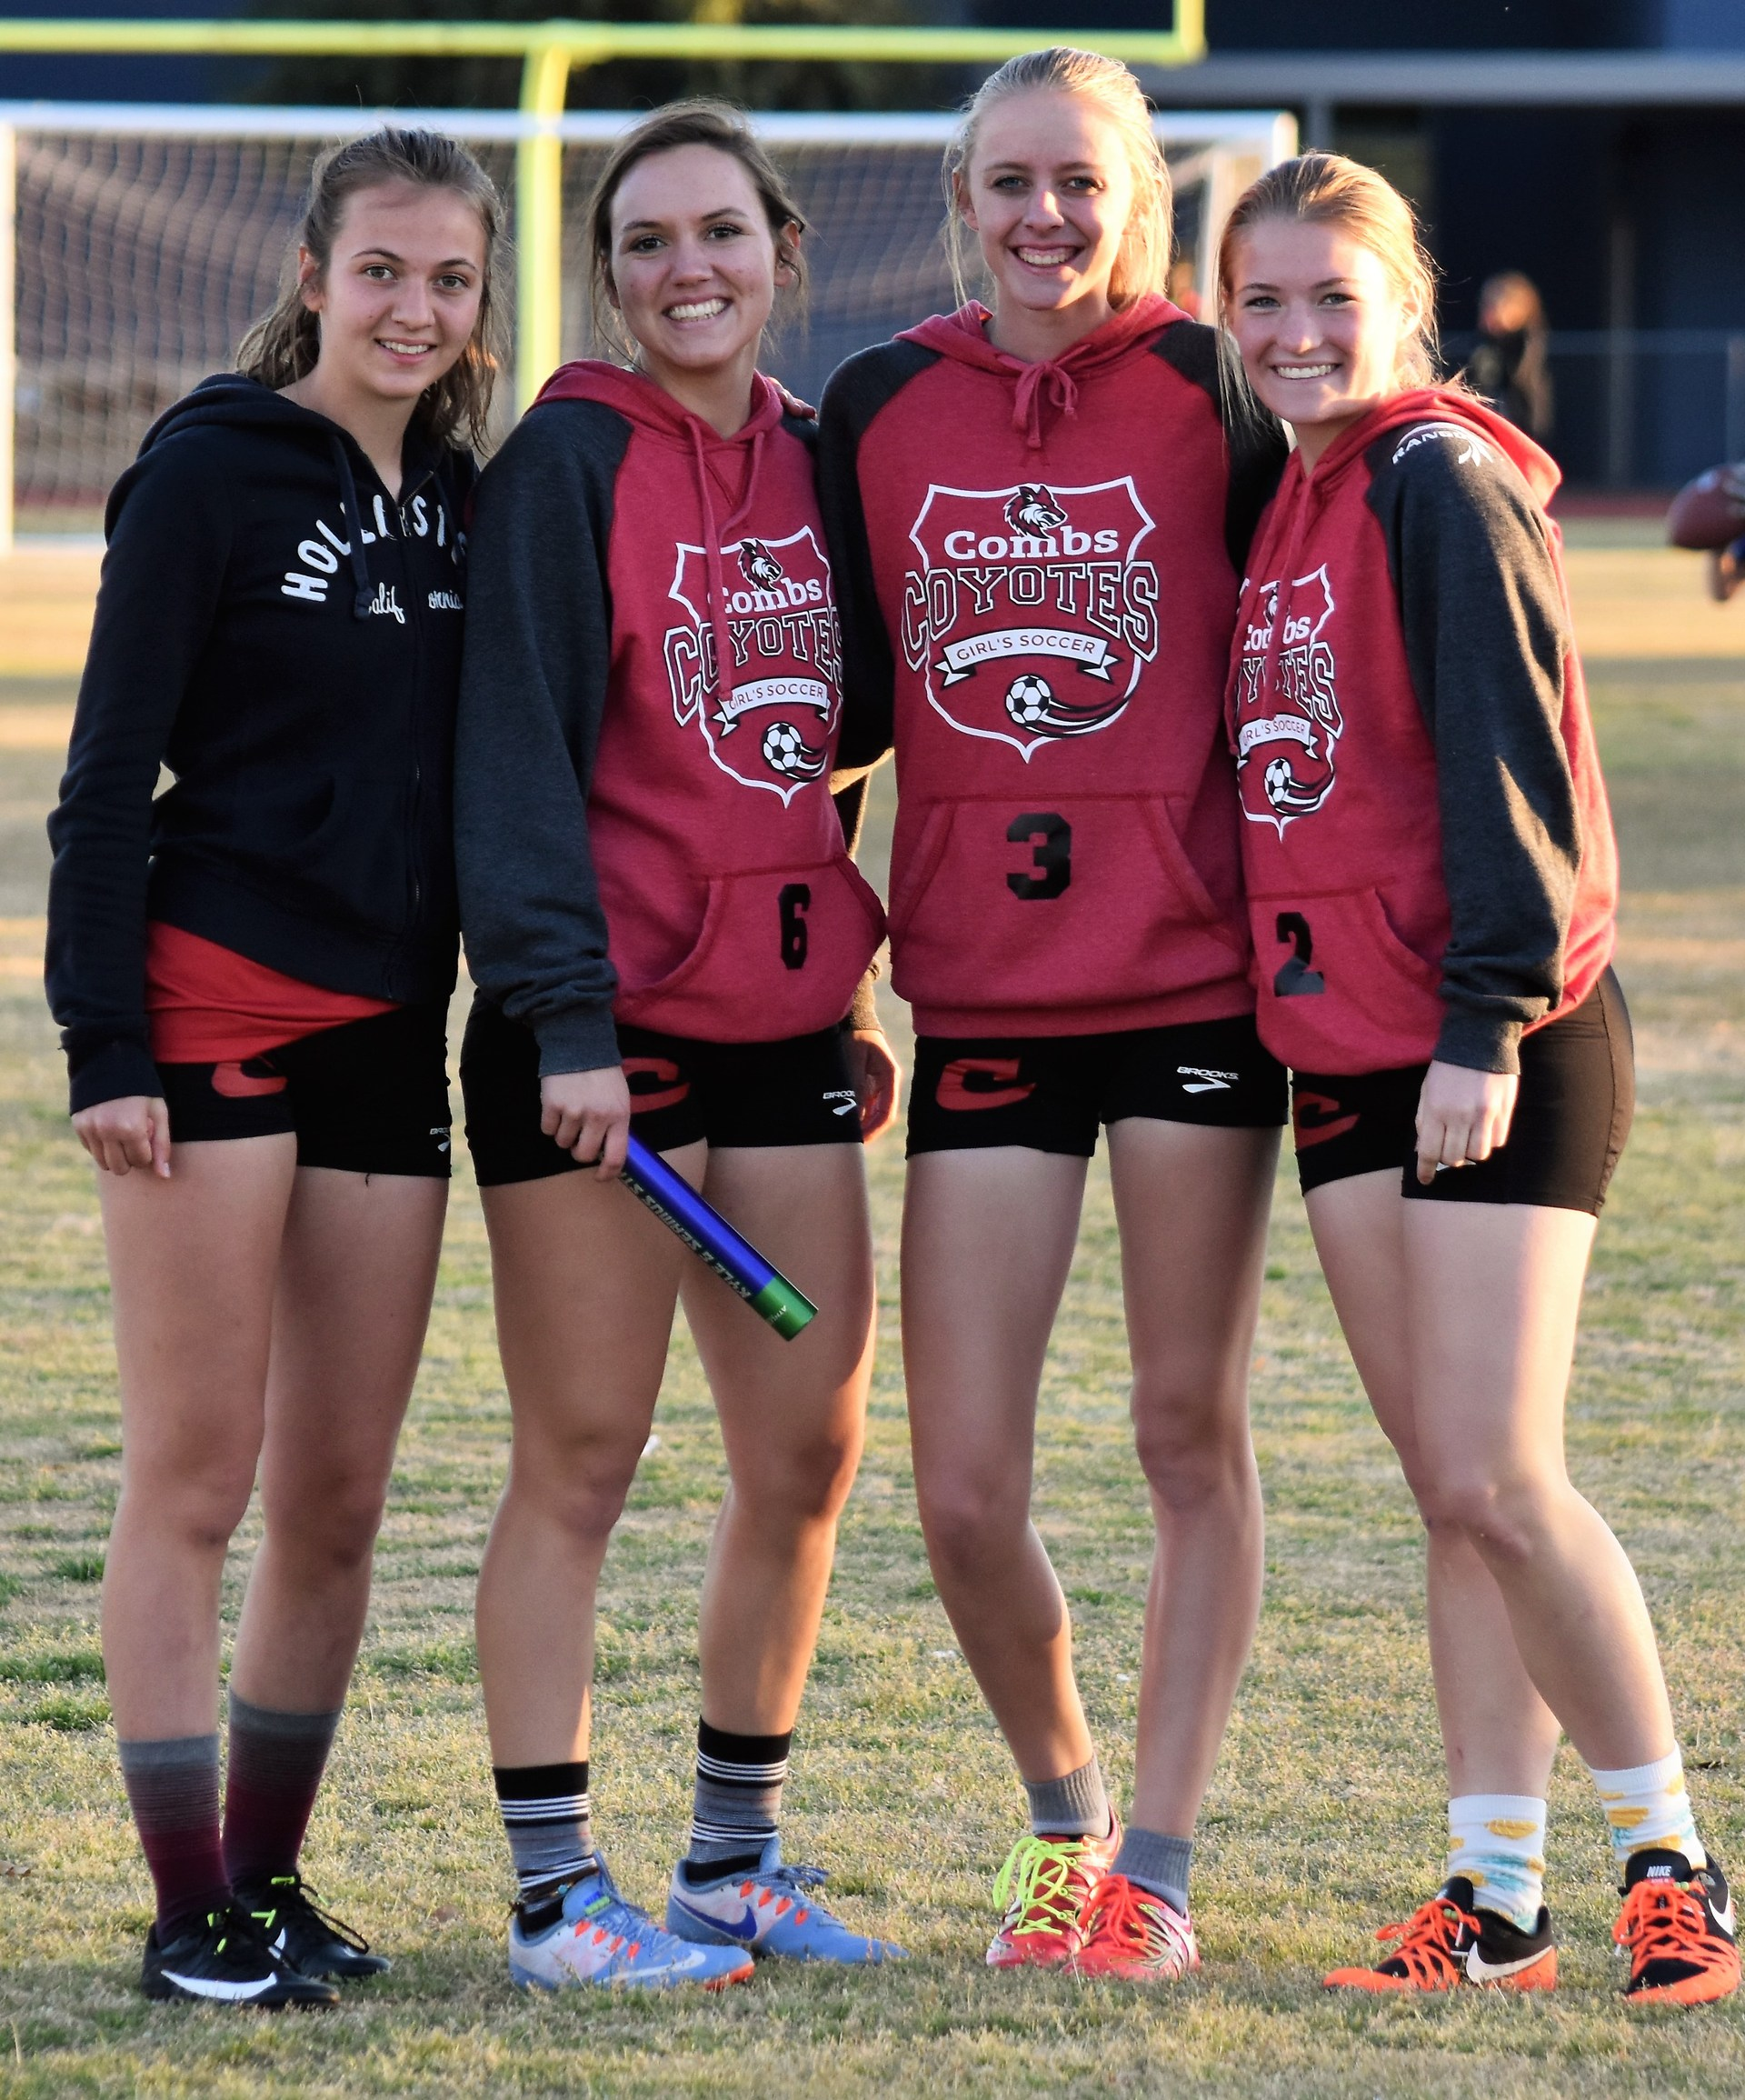 Girl relay race members